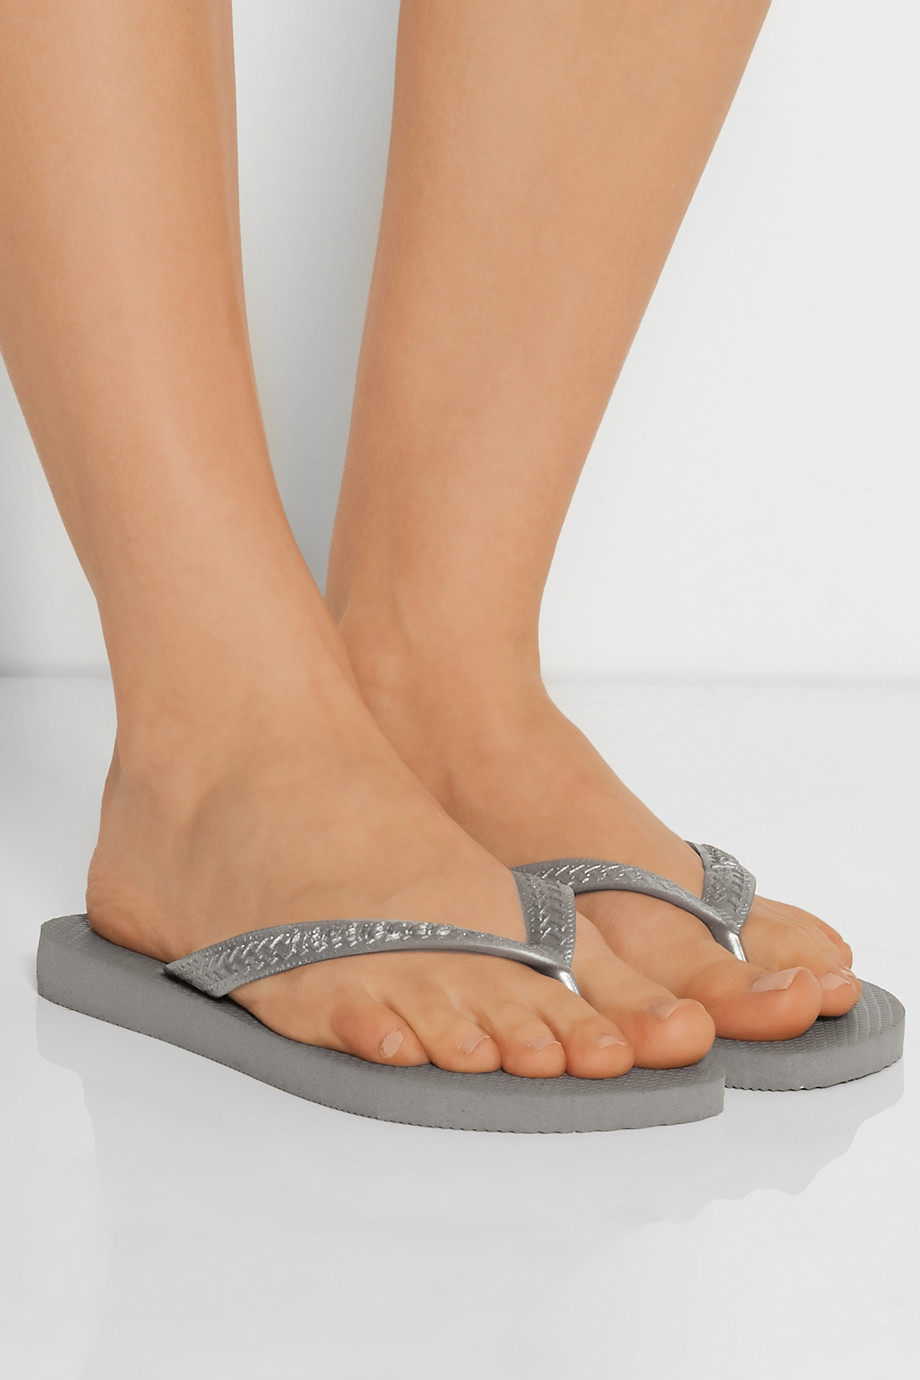 Thick Sole Flip Flops